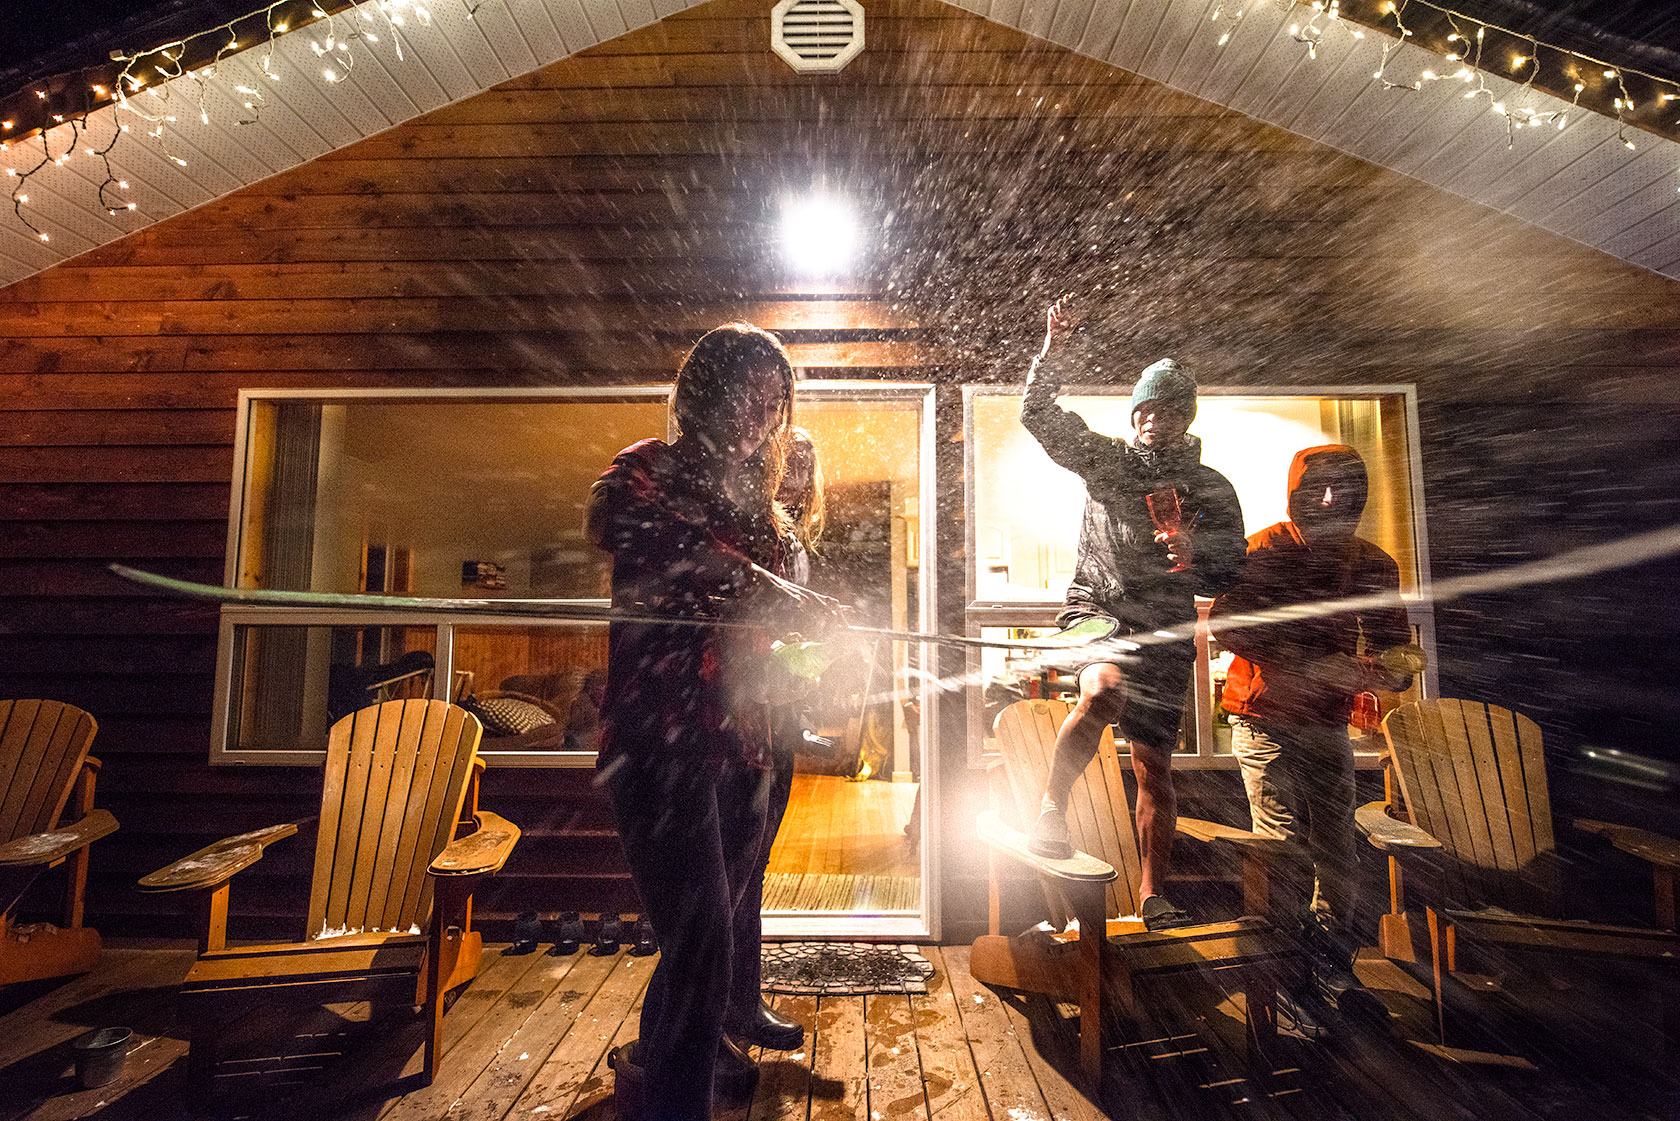 austin-trigg-patagonia-banff-alberta-winter-golden-british-columbia-pop-bottles-canada-trip-adventure-outside-snow-forest-cabin.jpg